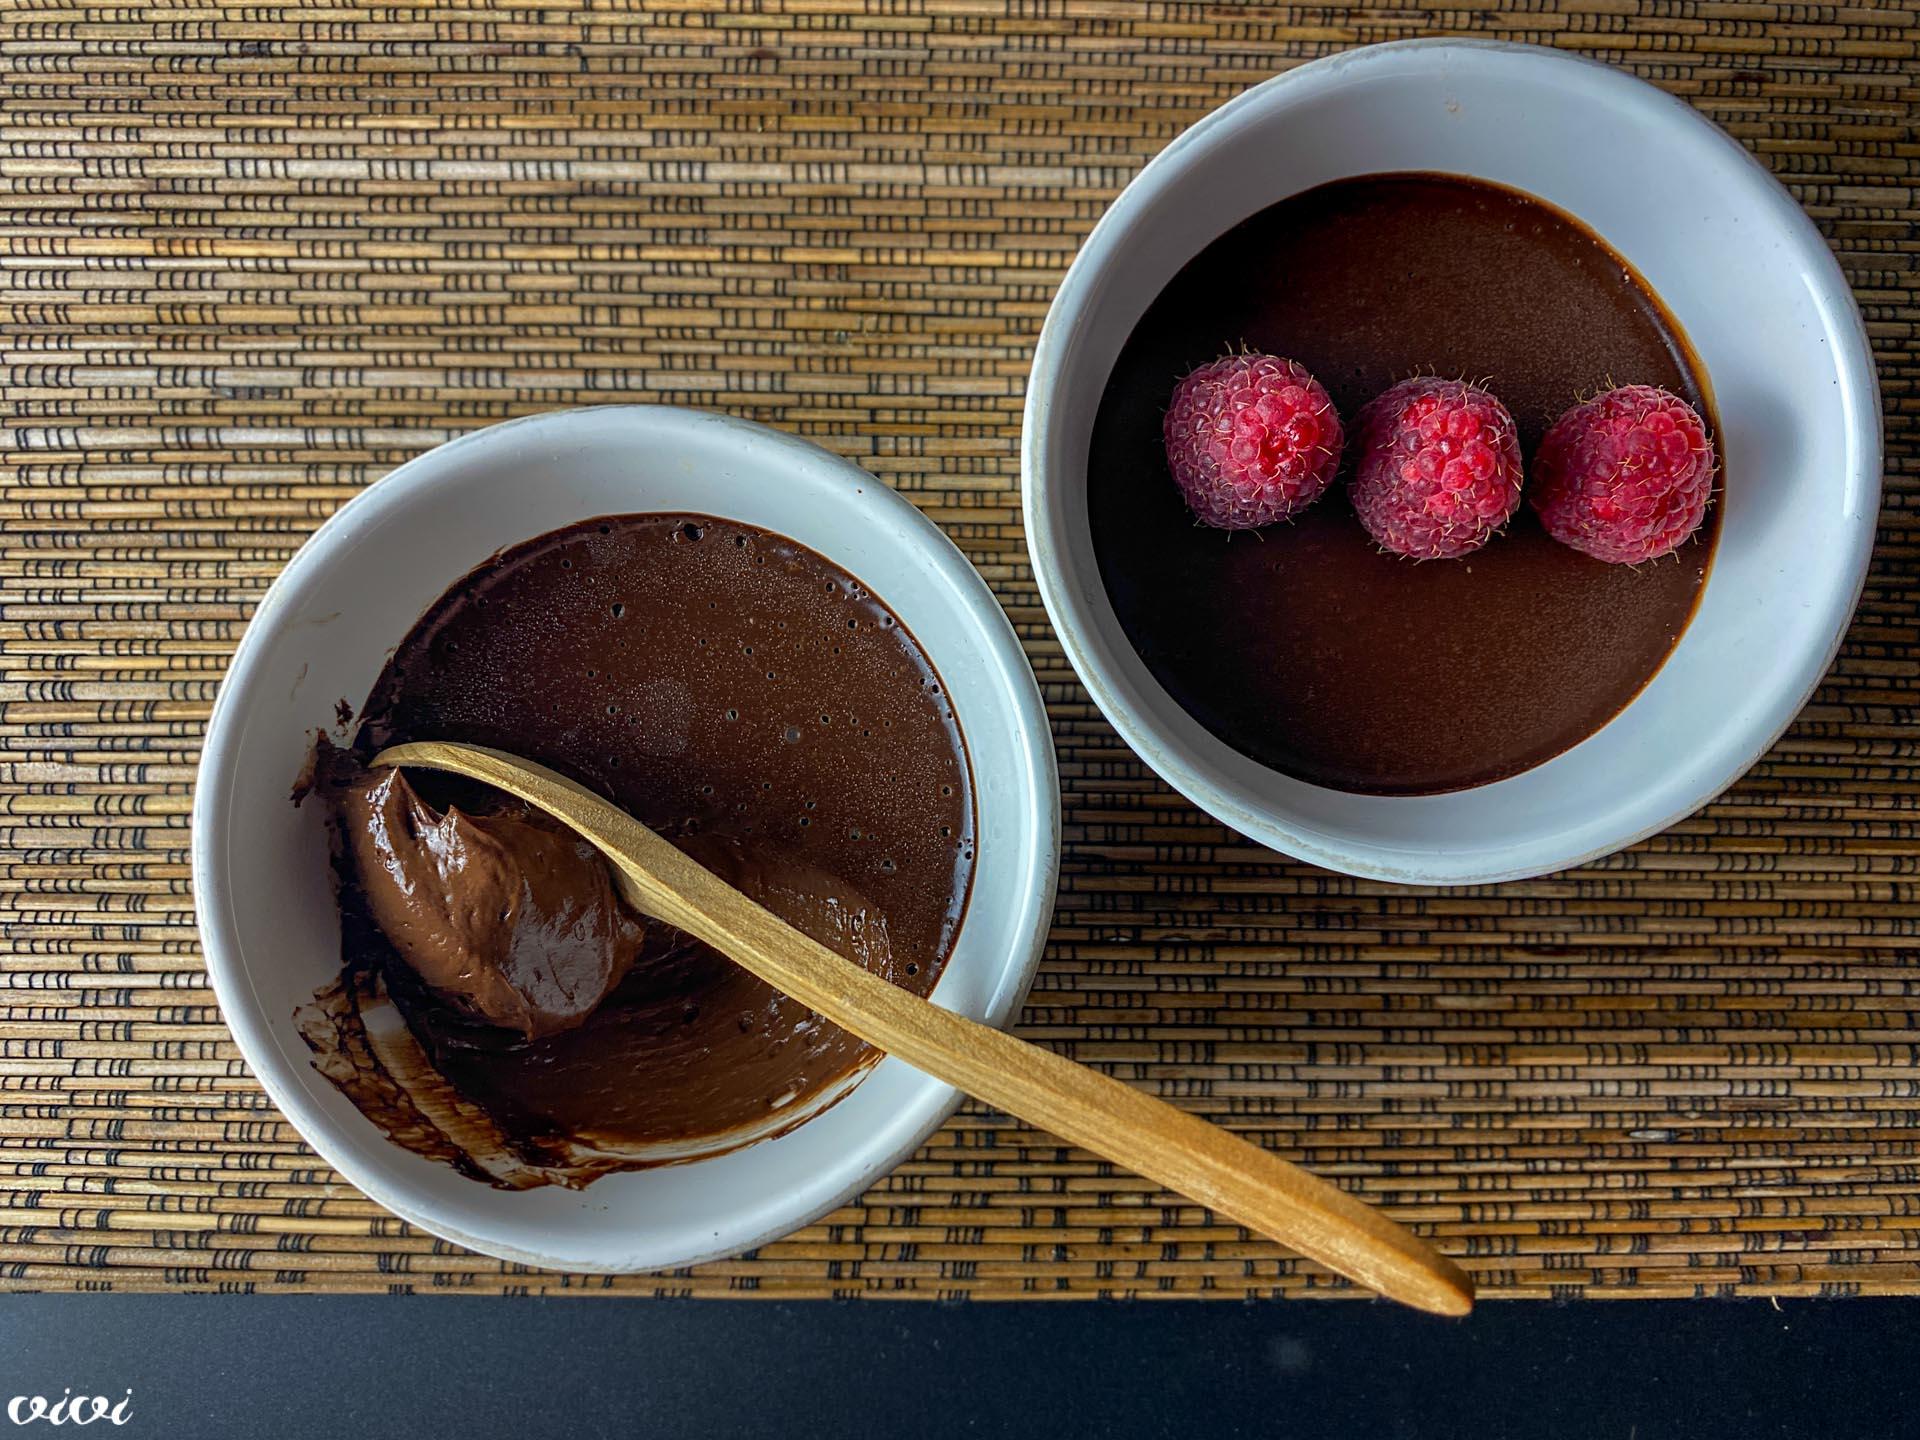 čokoladni ganache mousse6